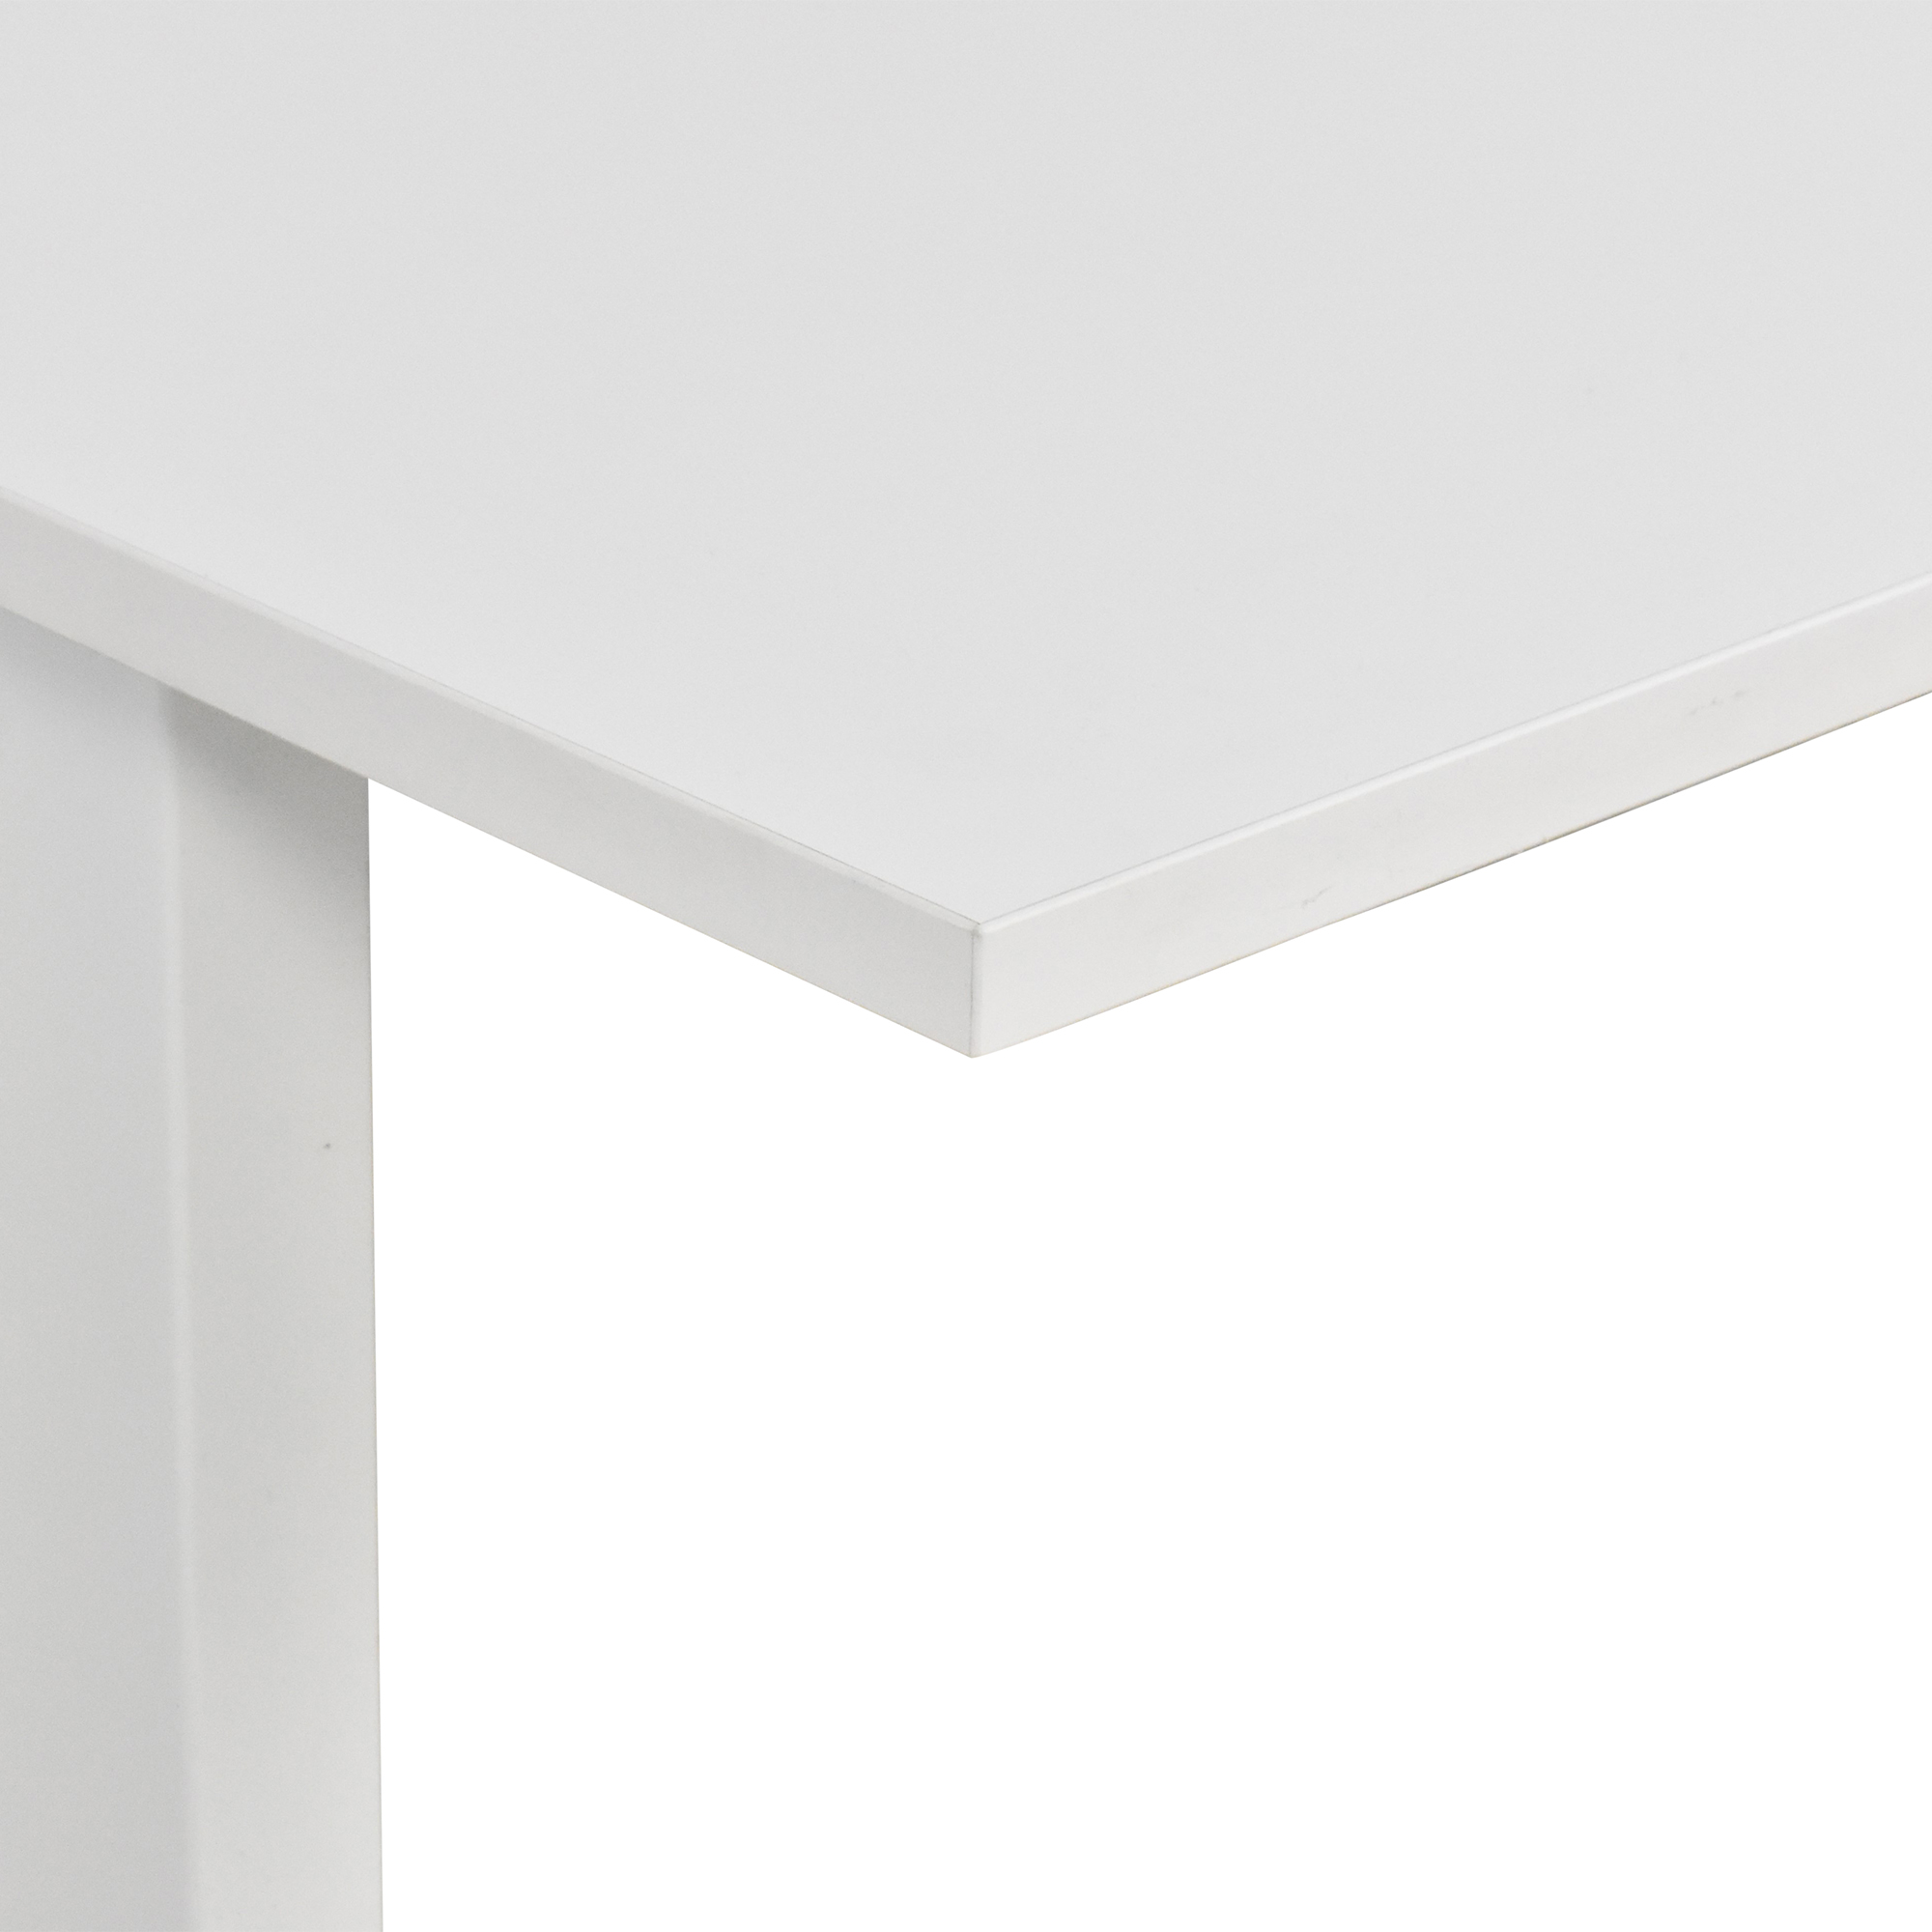 Herman Miller Herman Miller Motia Sit to Stand Desk on sale